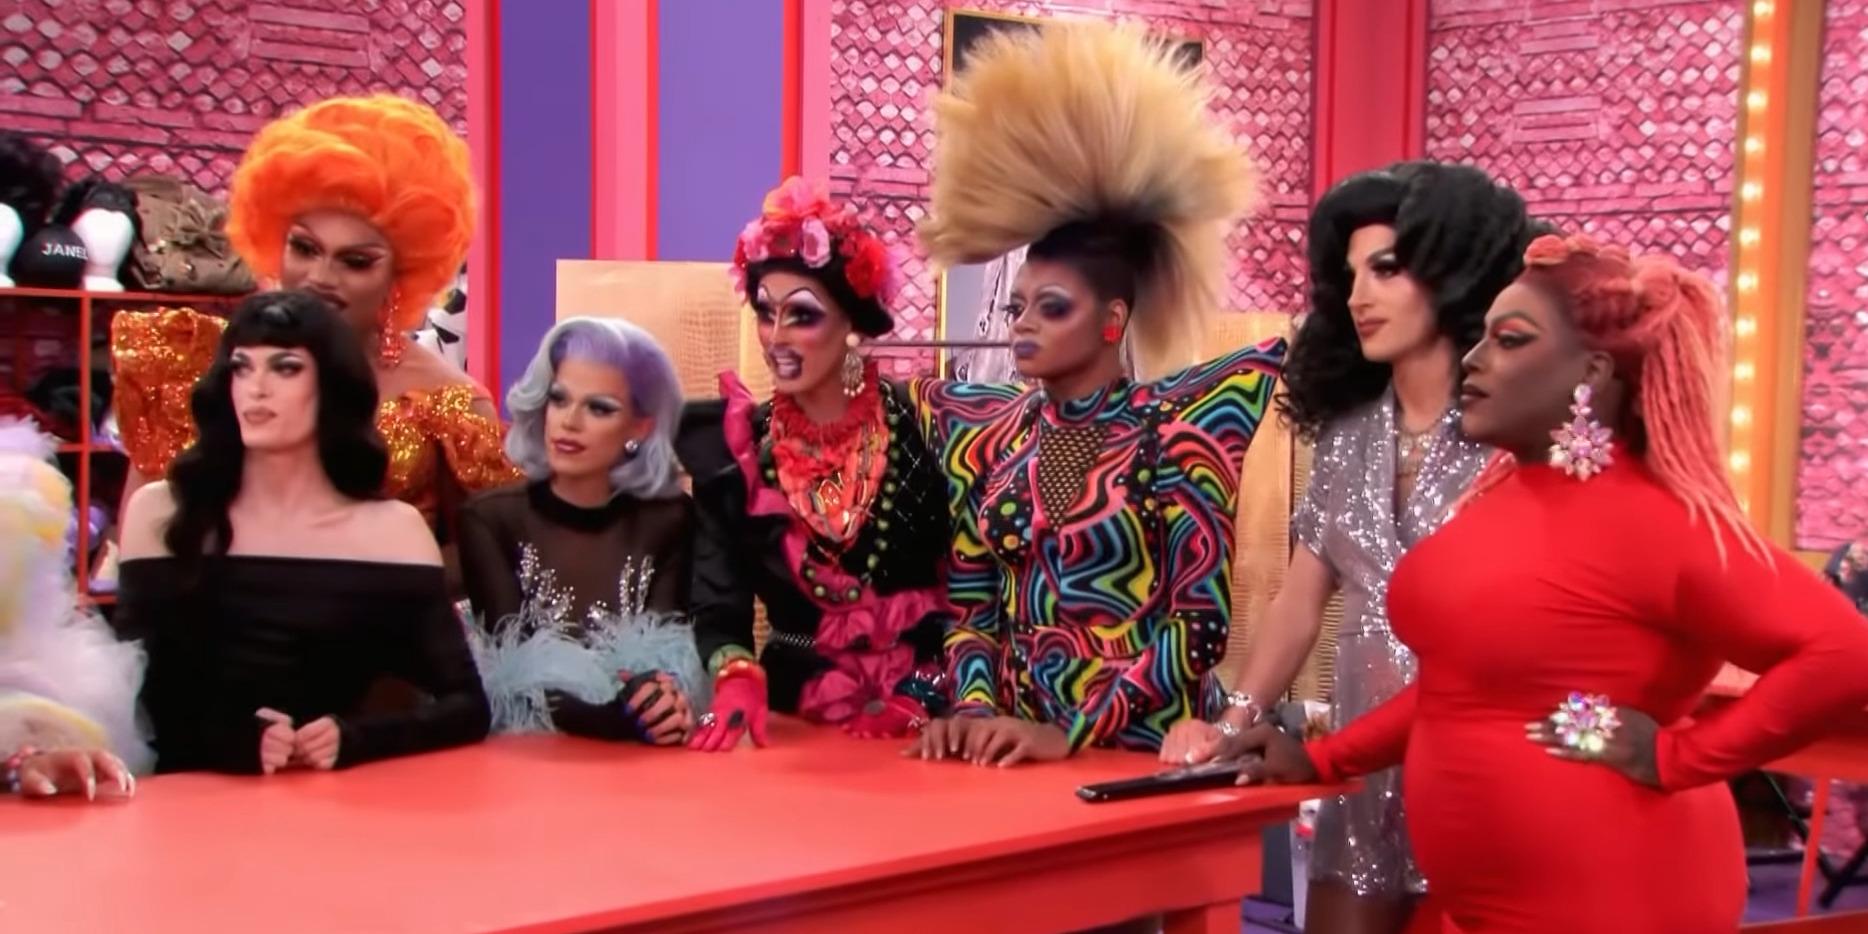 RuPaul's Drag Race Season 12 Episode 4